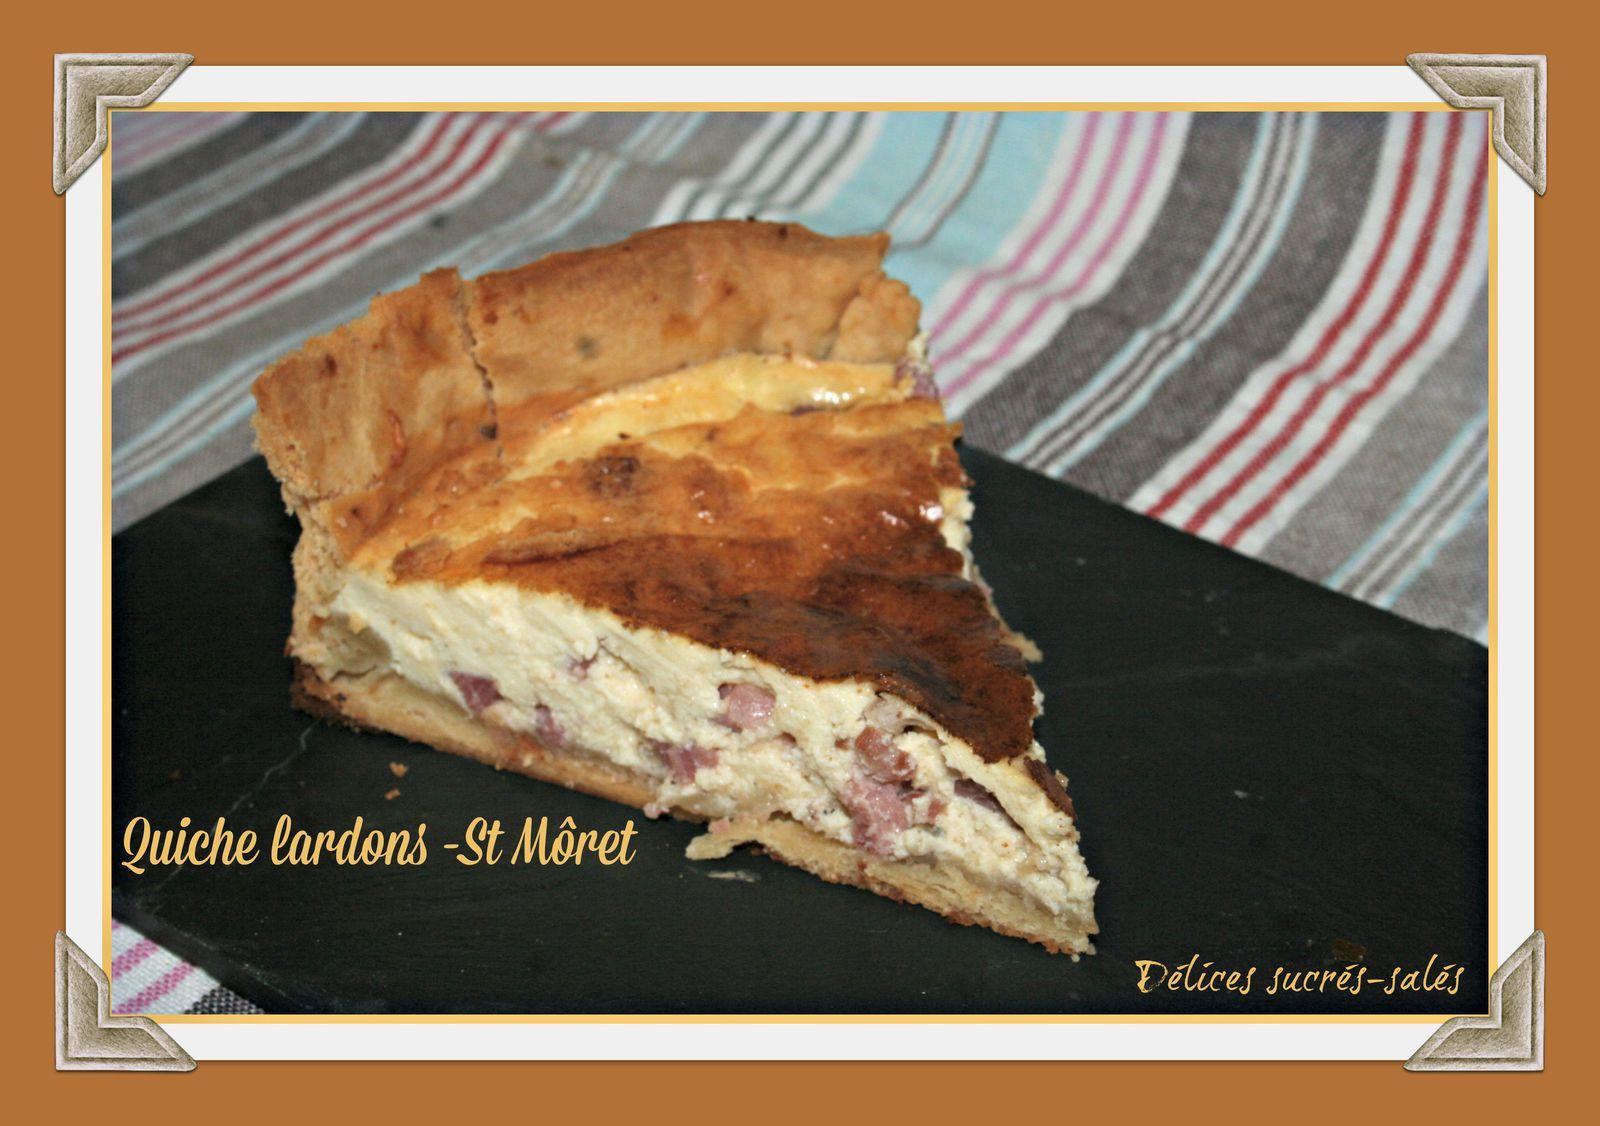 Quiche lardons -St Môret